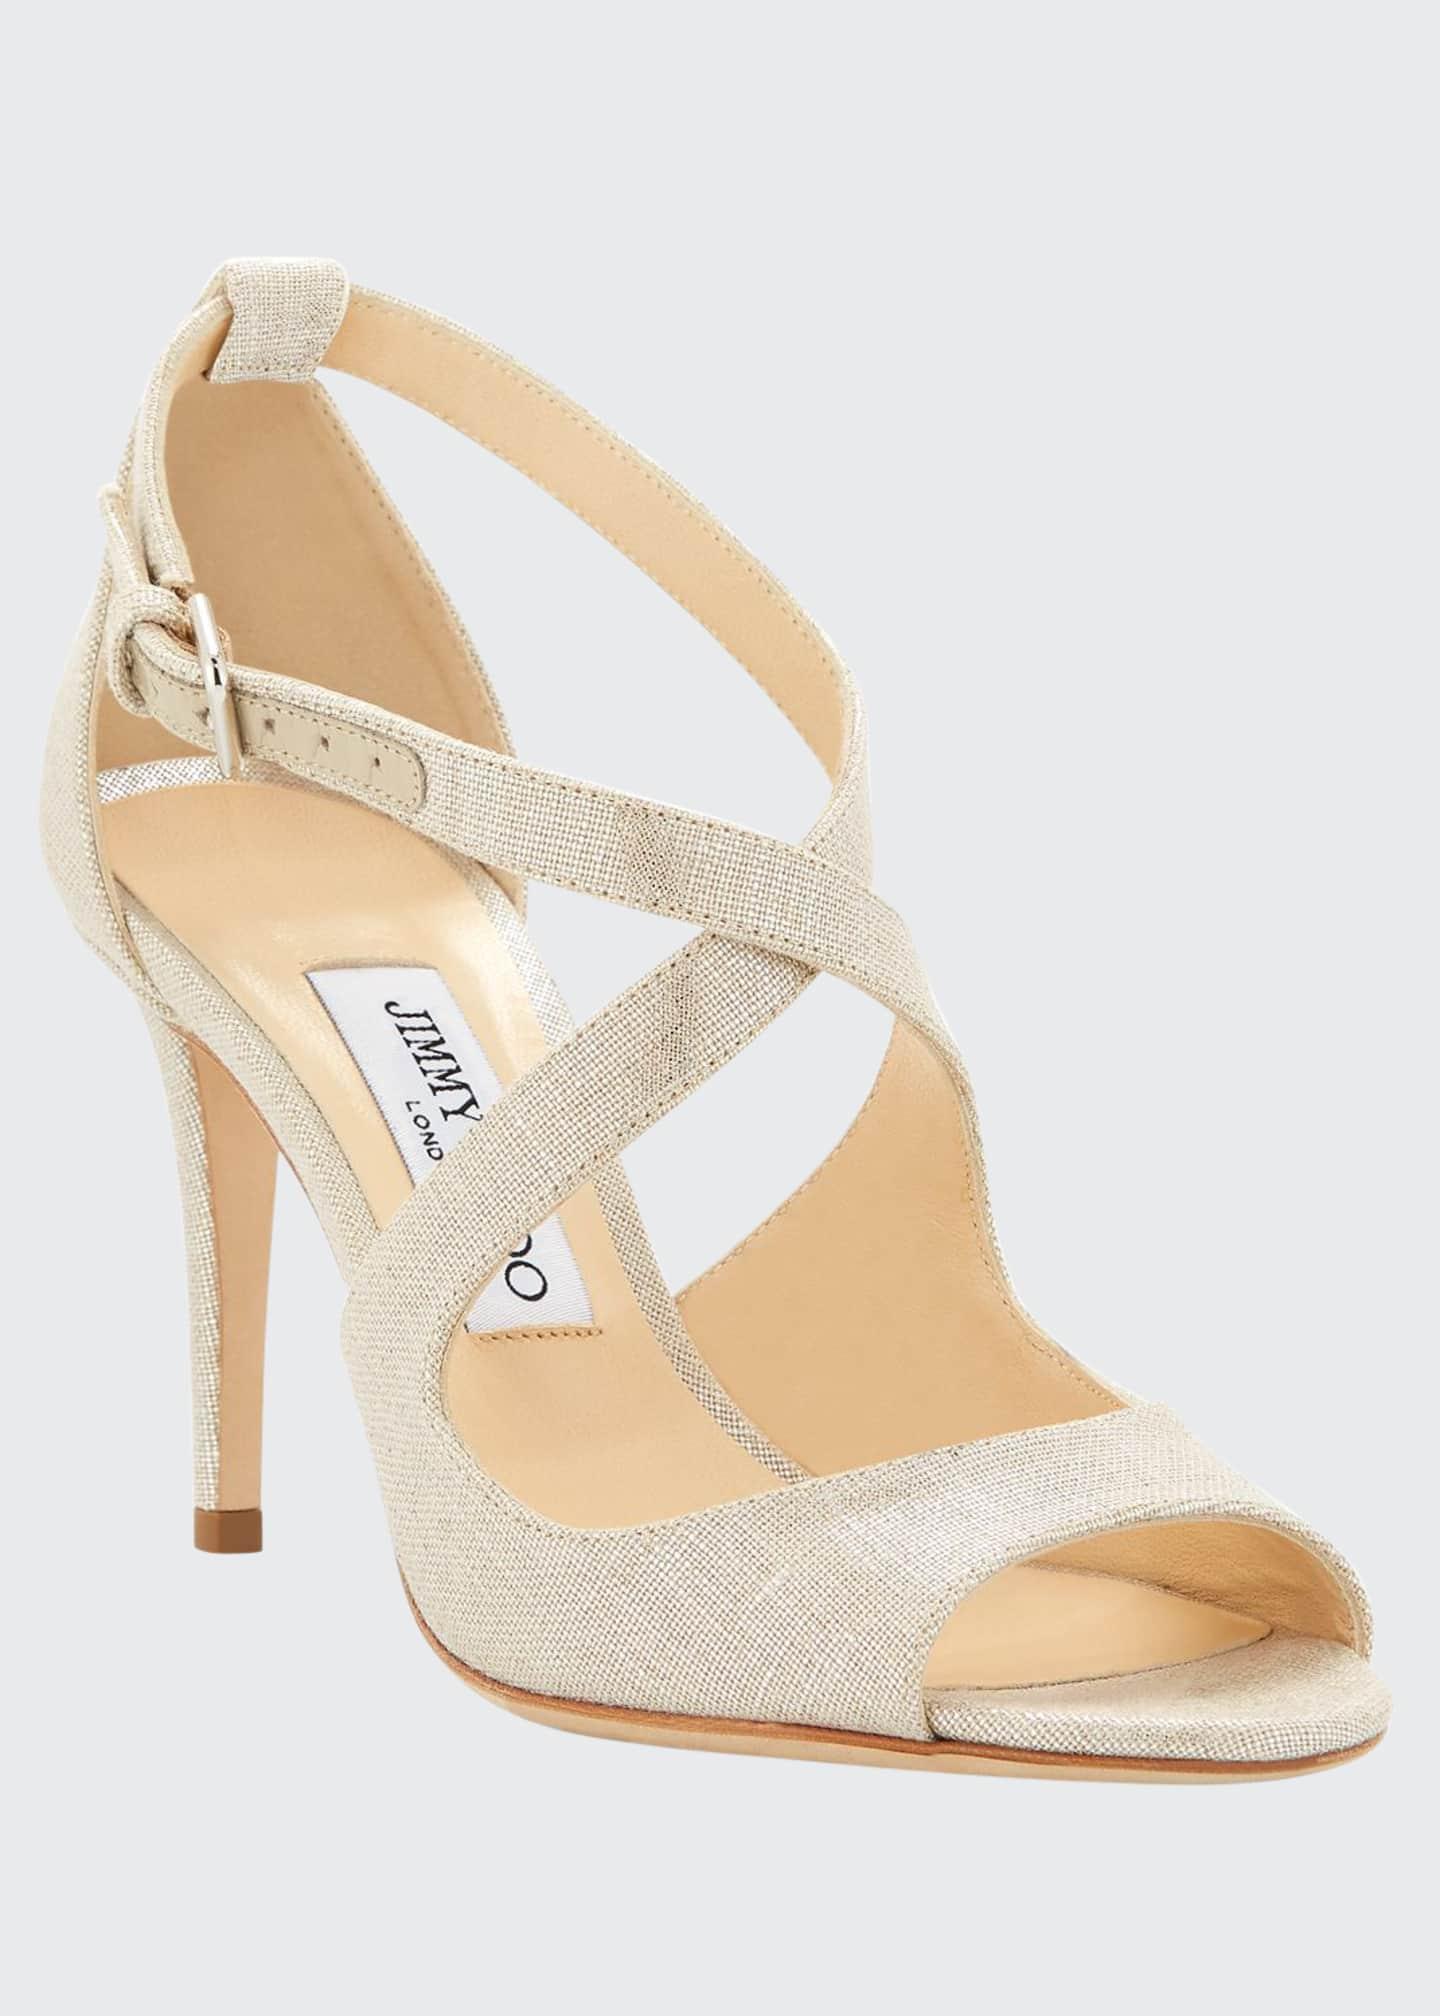 Jimmy Choo Emily Metallic Woven Sandals